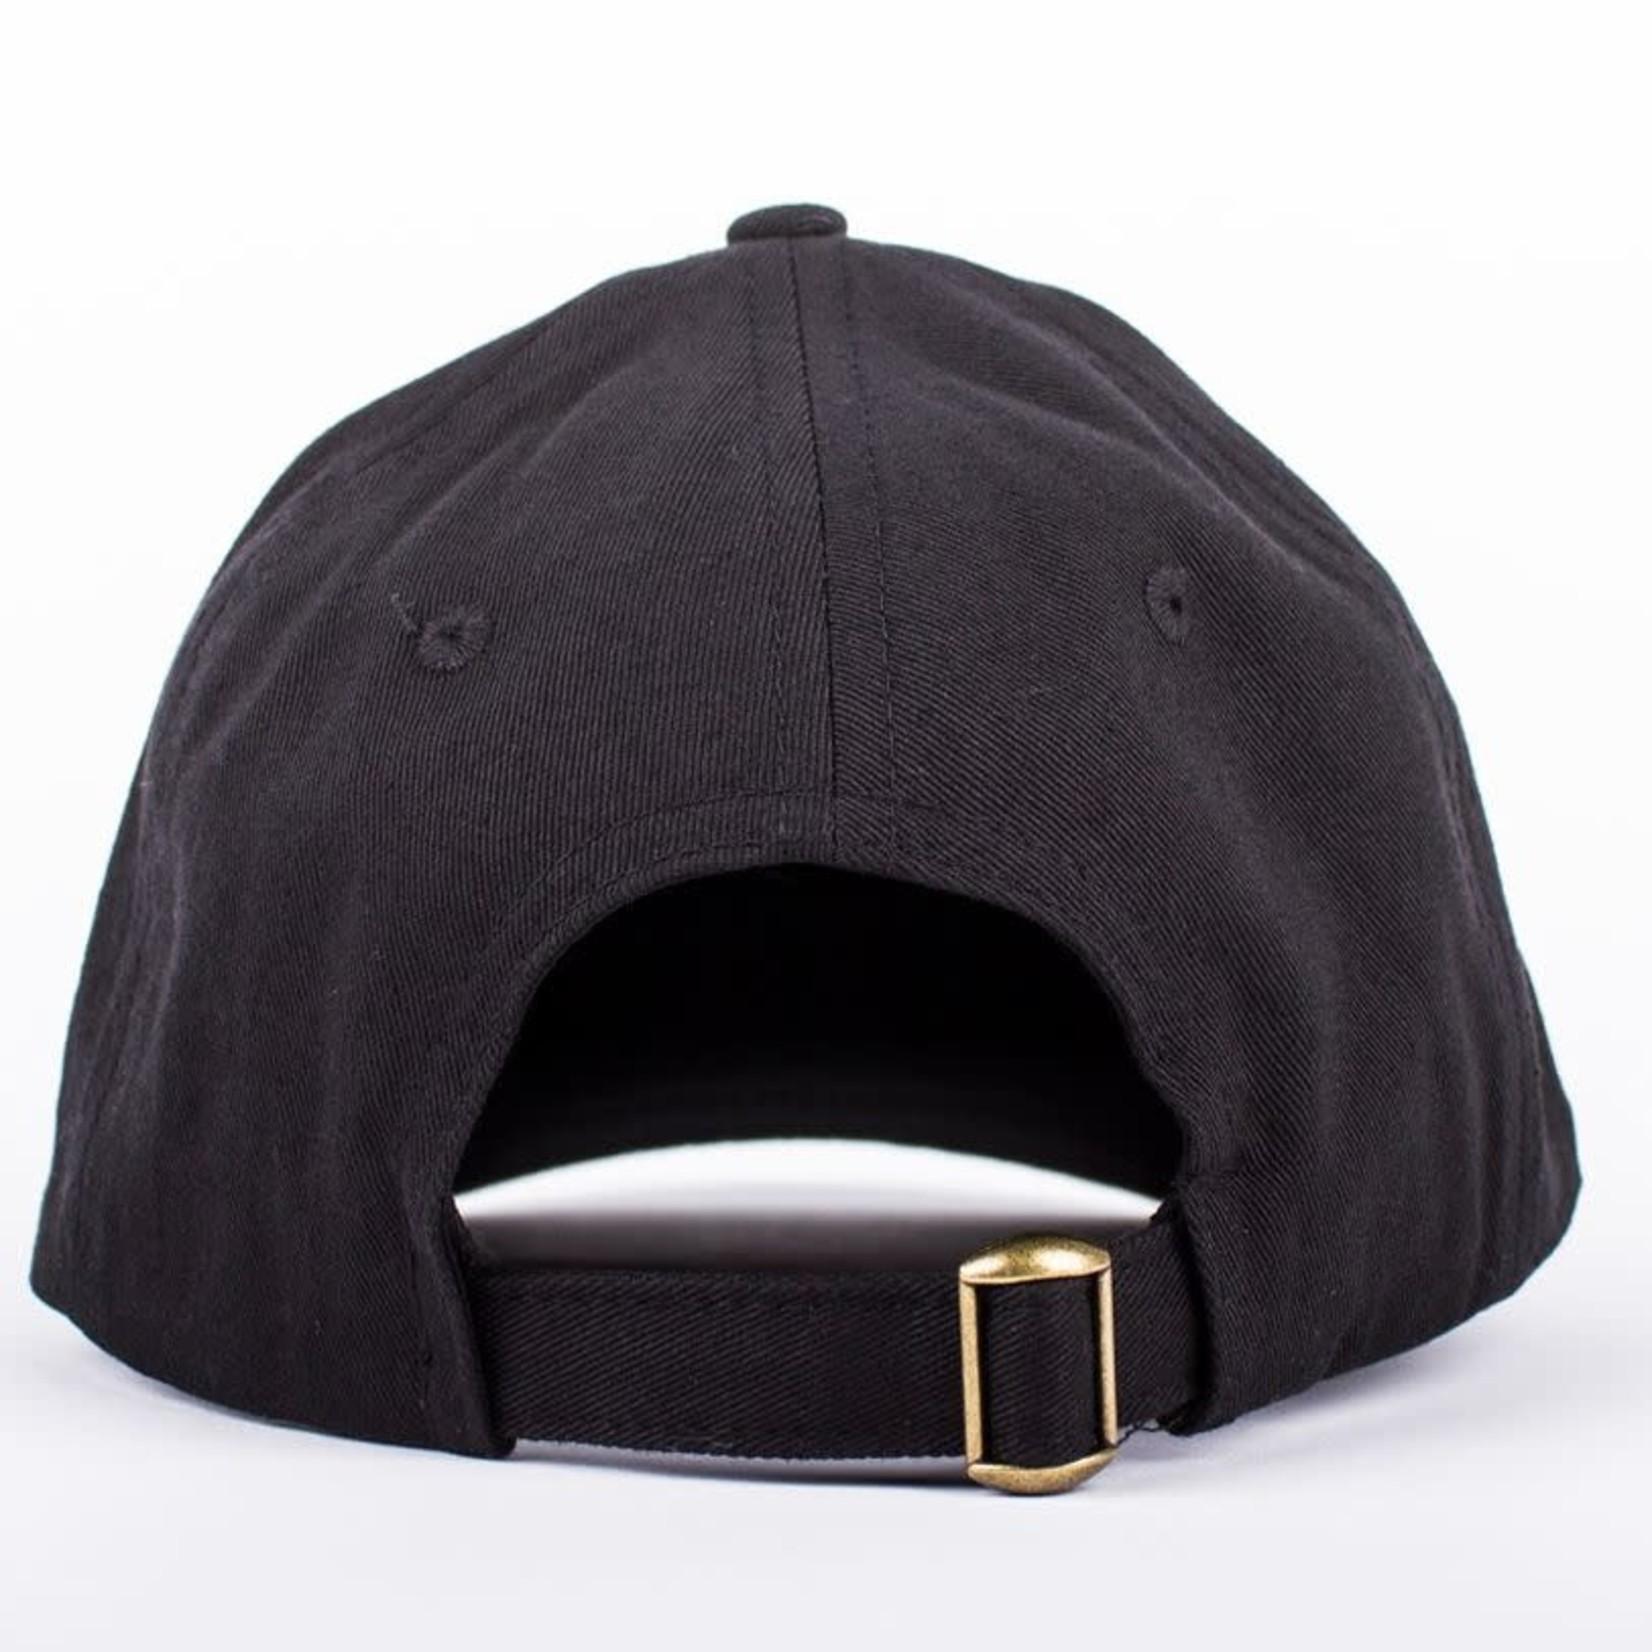 WLKN WLKN : Jays Dad Hat Black O/S